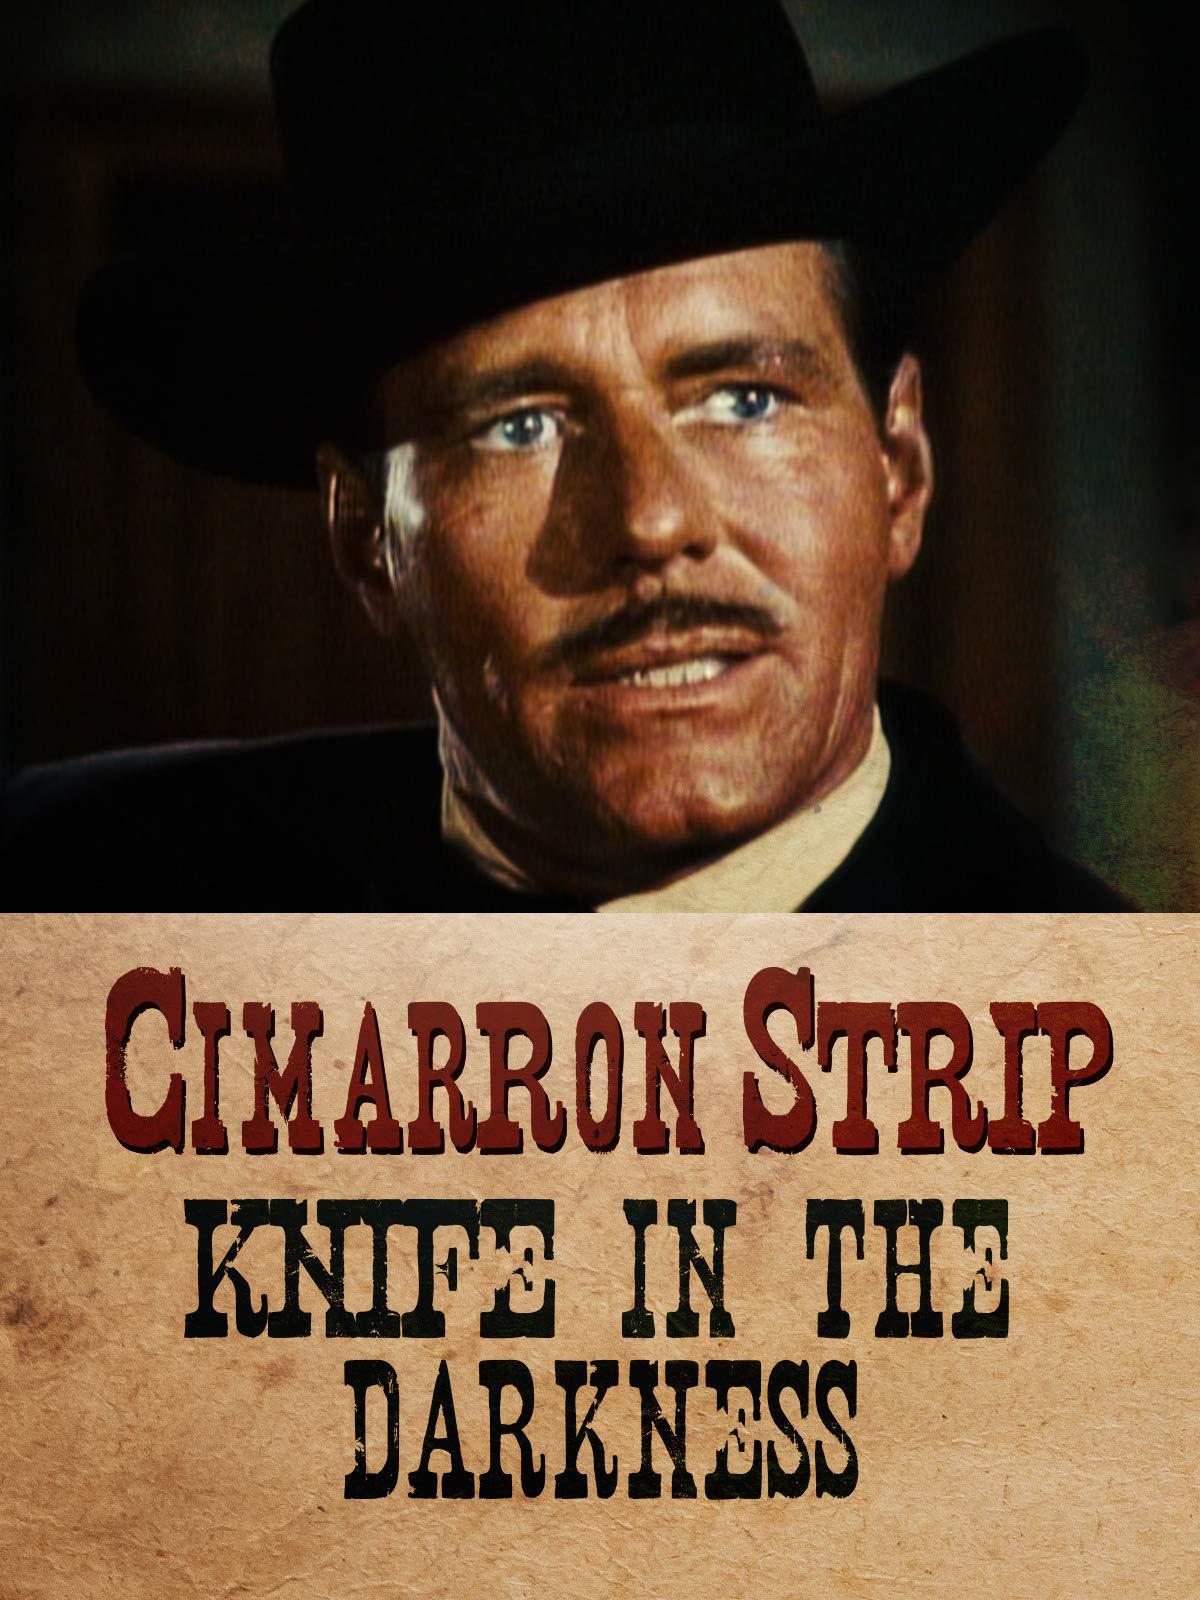 Cimarron Strip - Knife in the Darkness